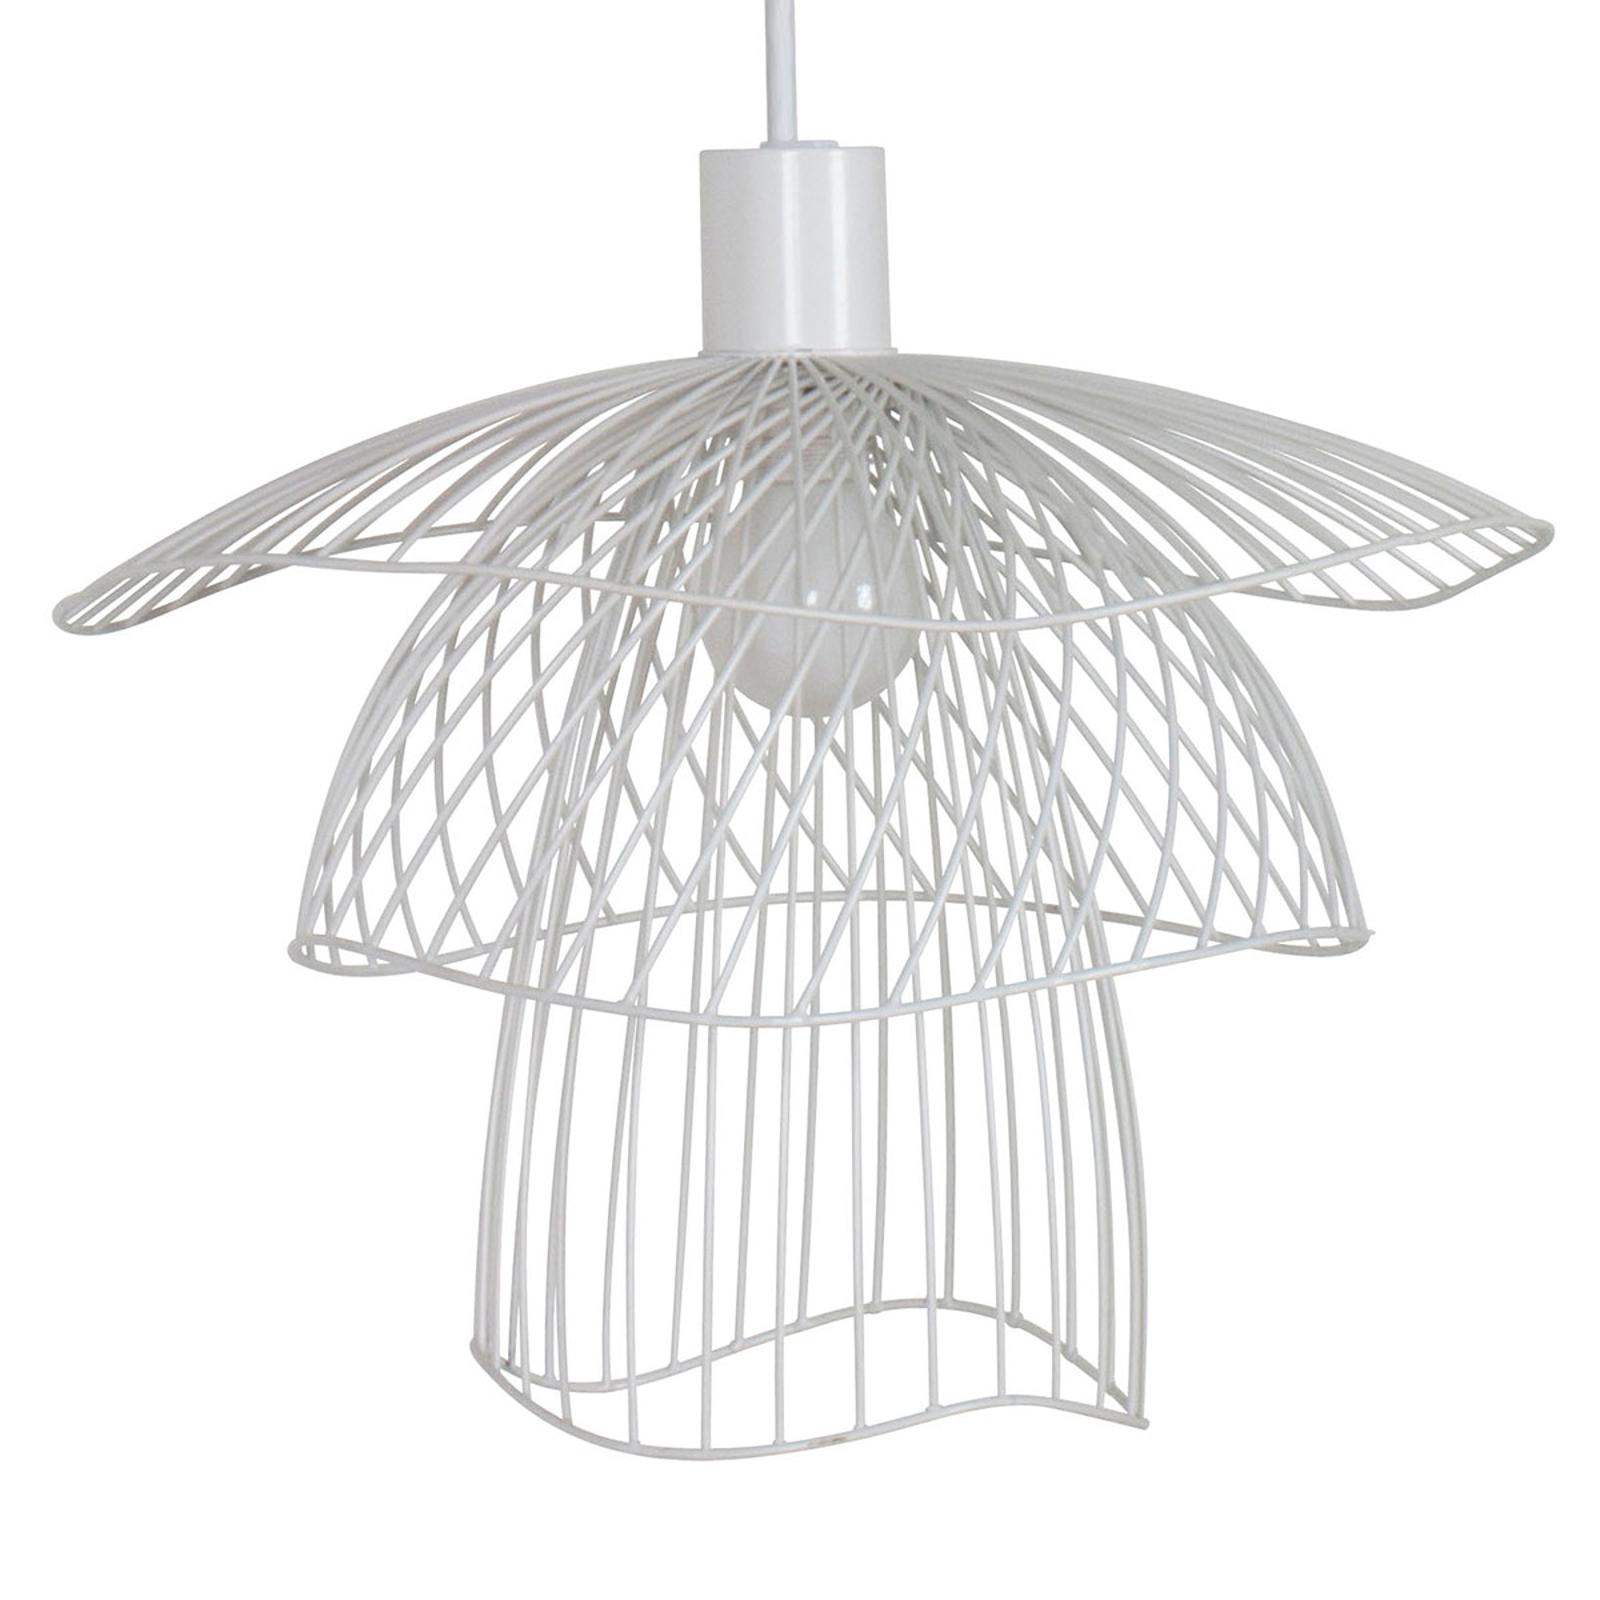 Forestier Papillon XS hanglamp 30 cm wit